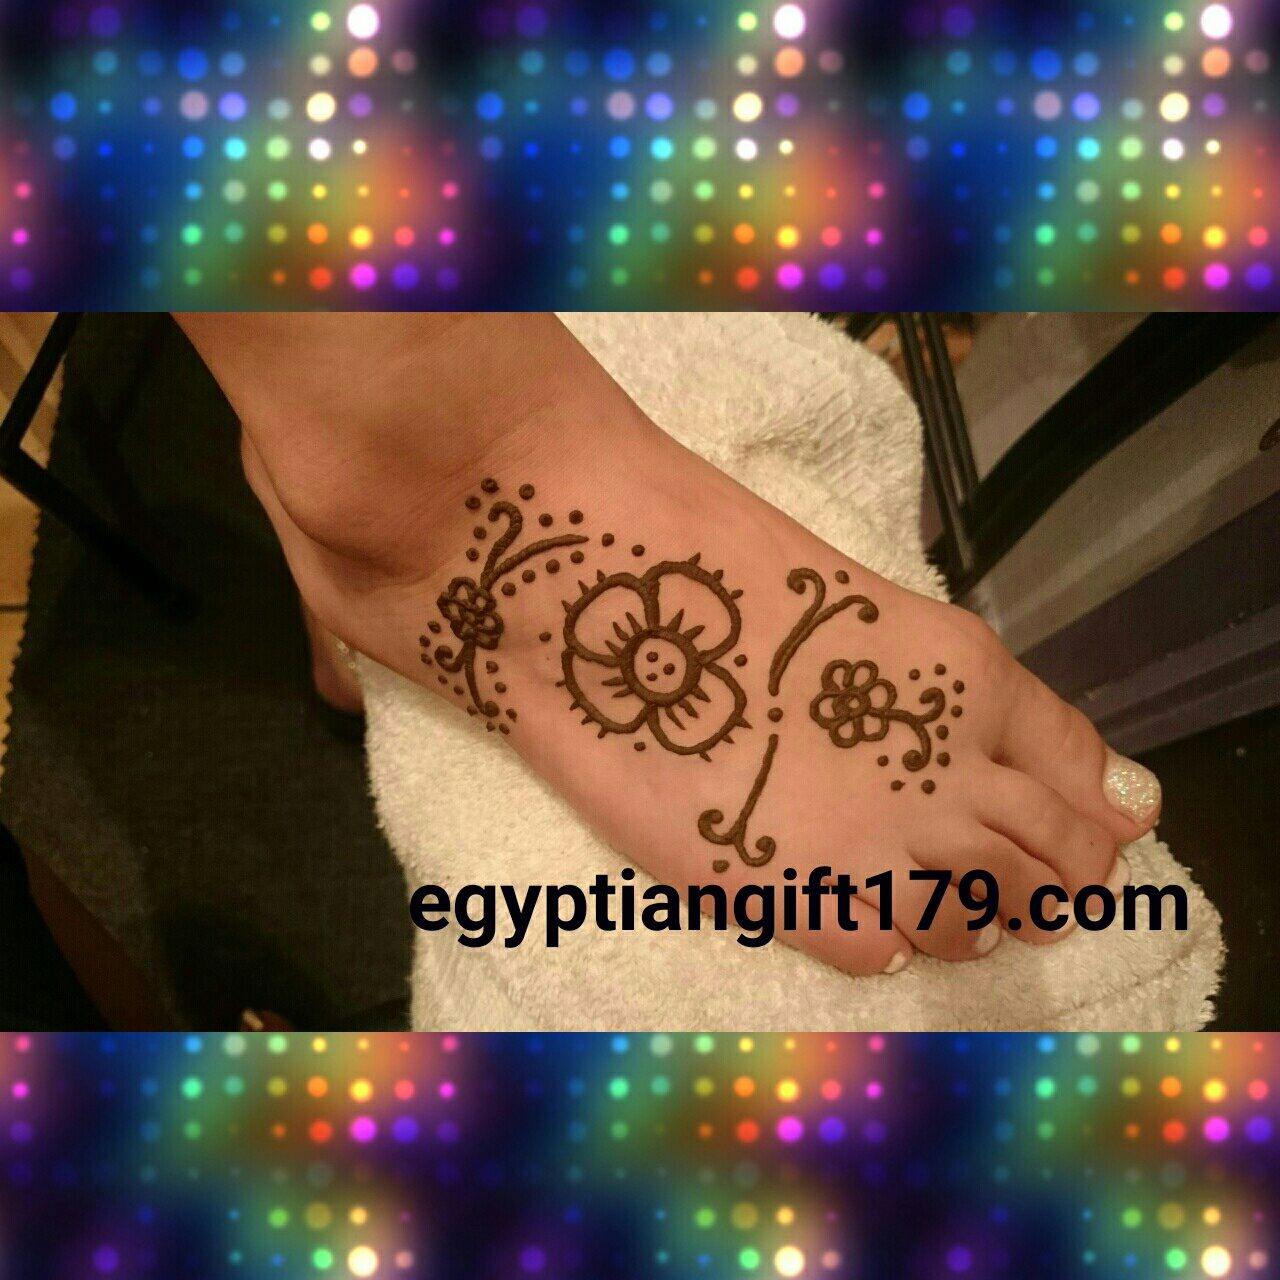 Egyptian gift corner tattoo near me henna shop tattoos